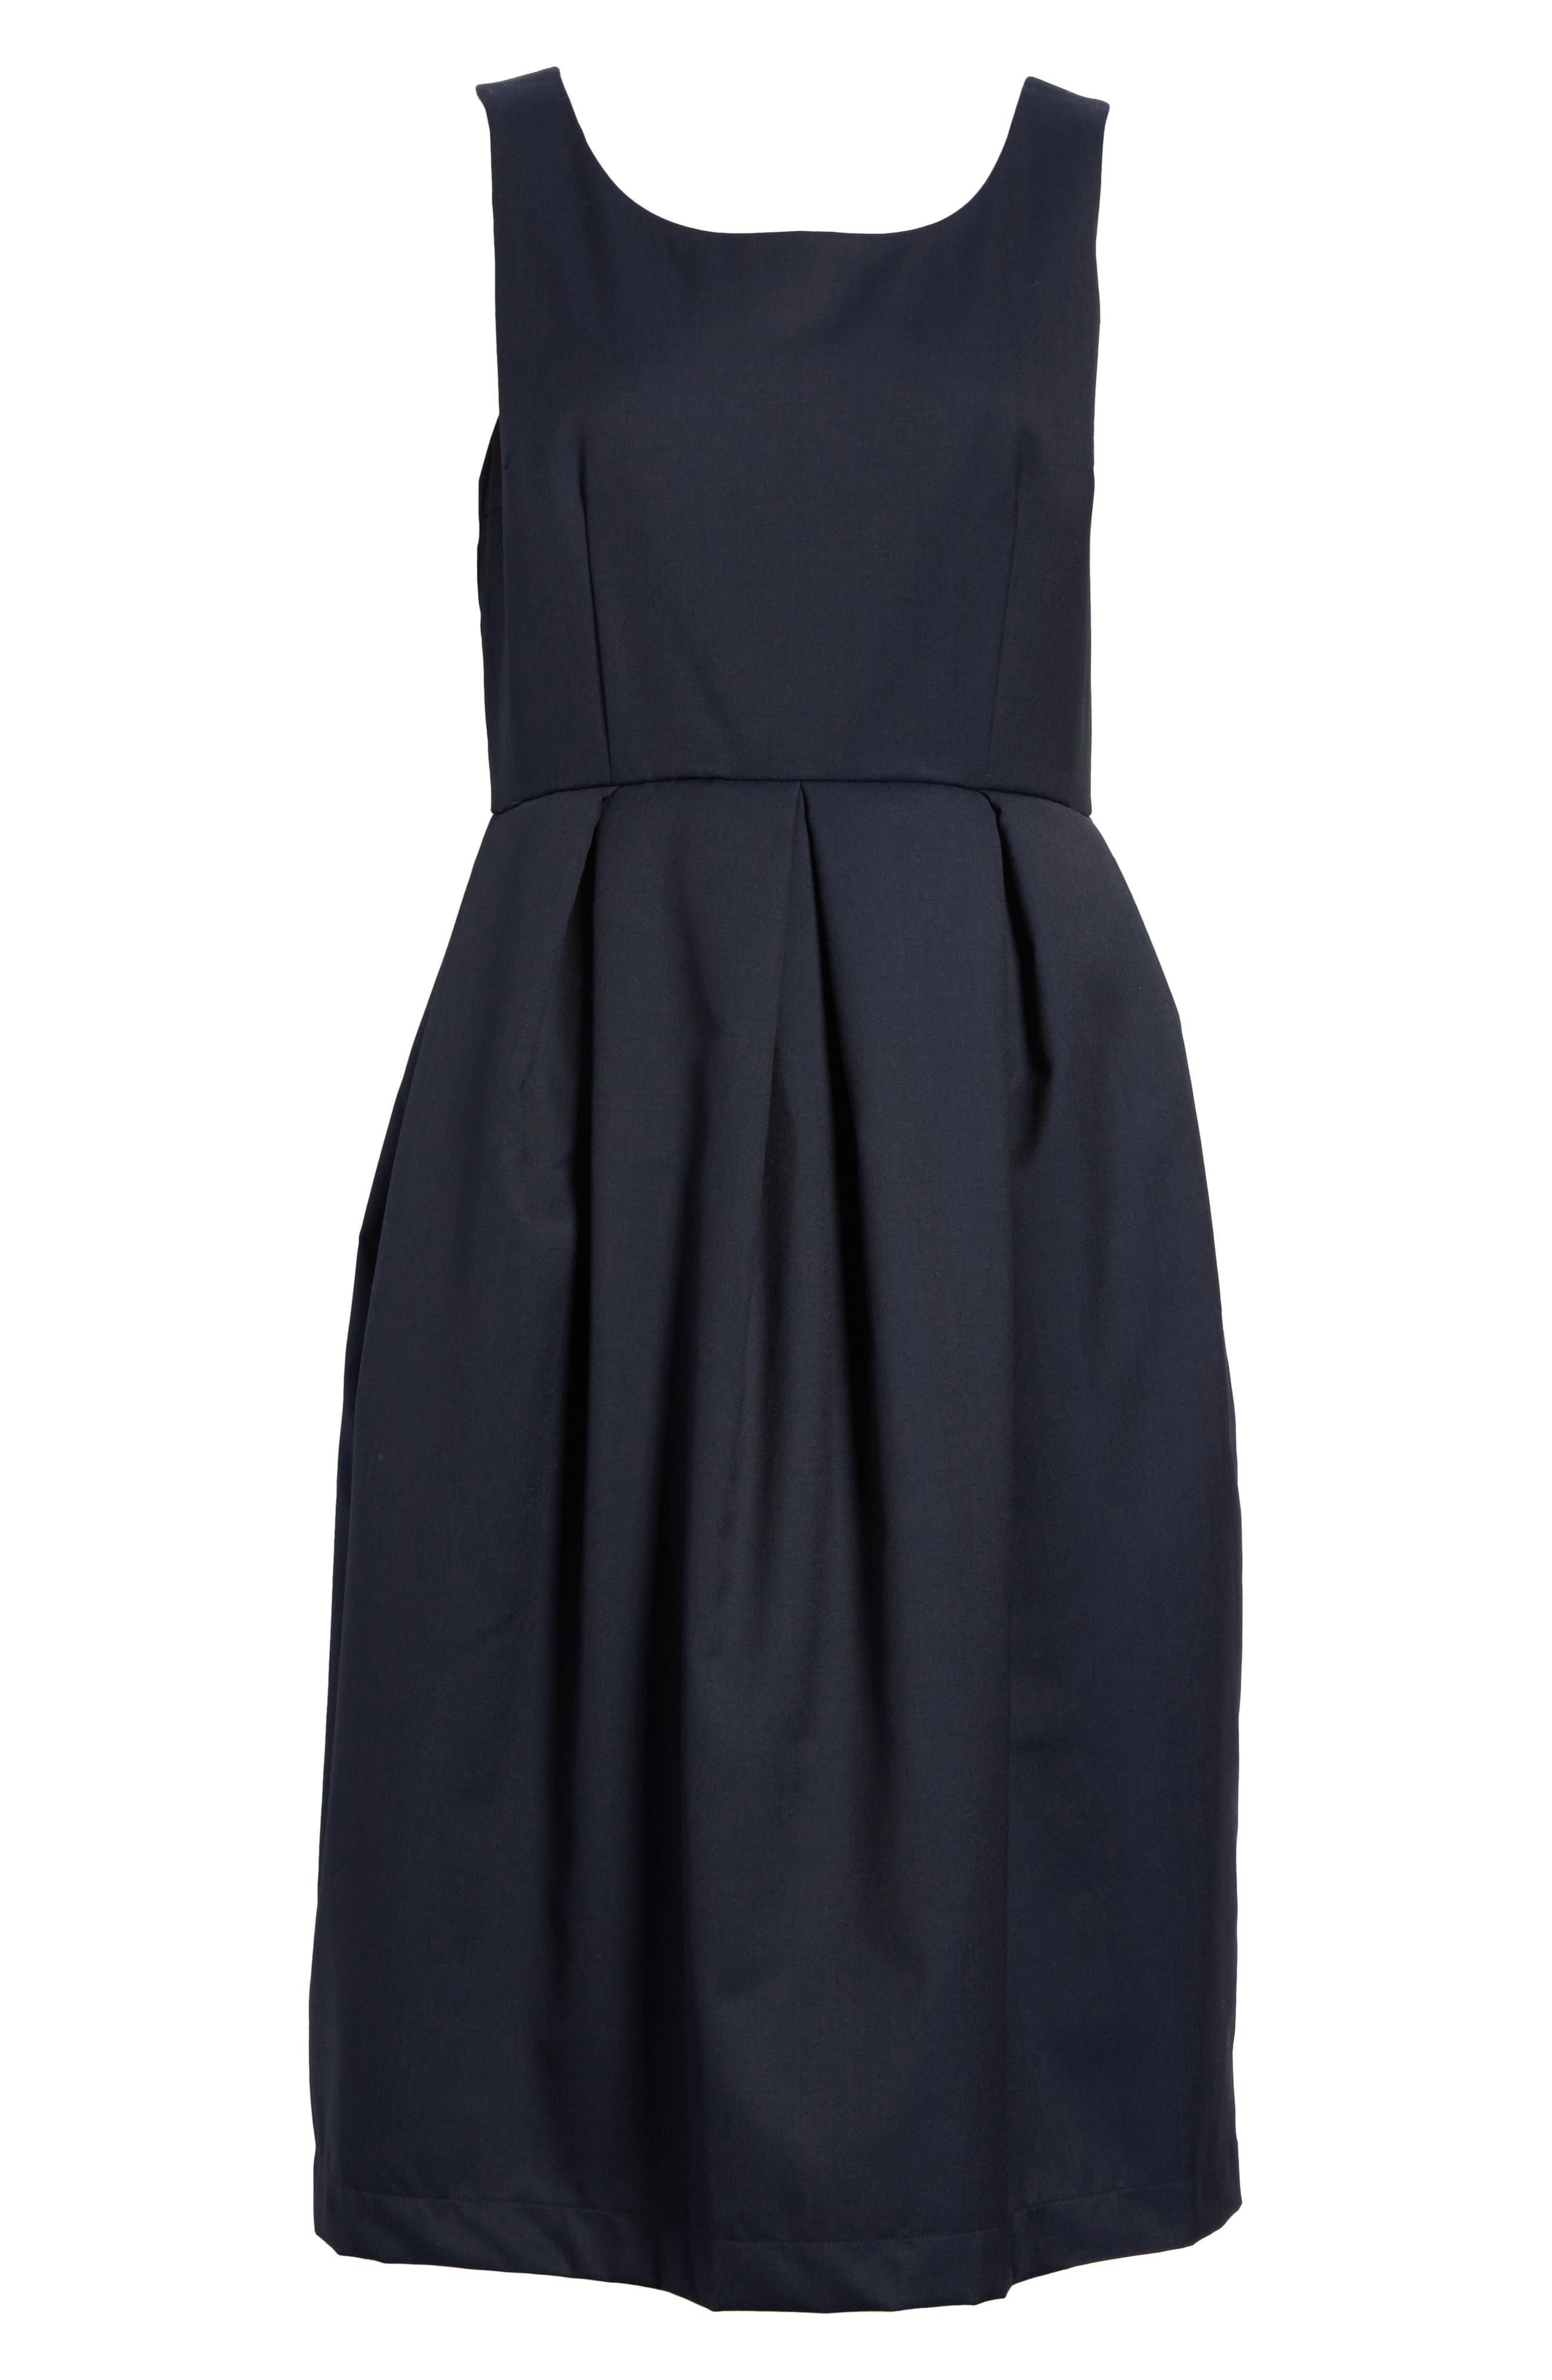 Comme de Garçons Sleeveless Fit & Flare Dress,                             Alternate thumbnail 6, color,                             400